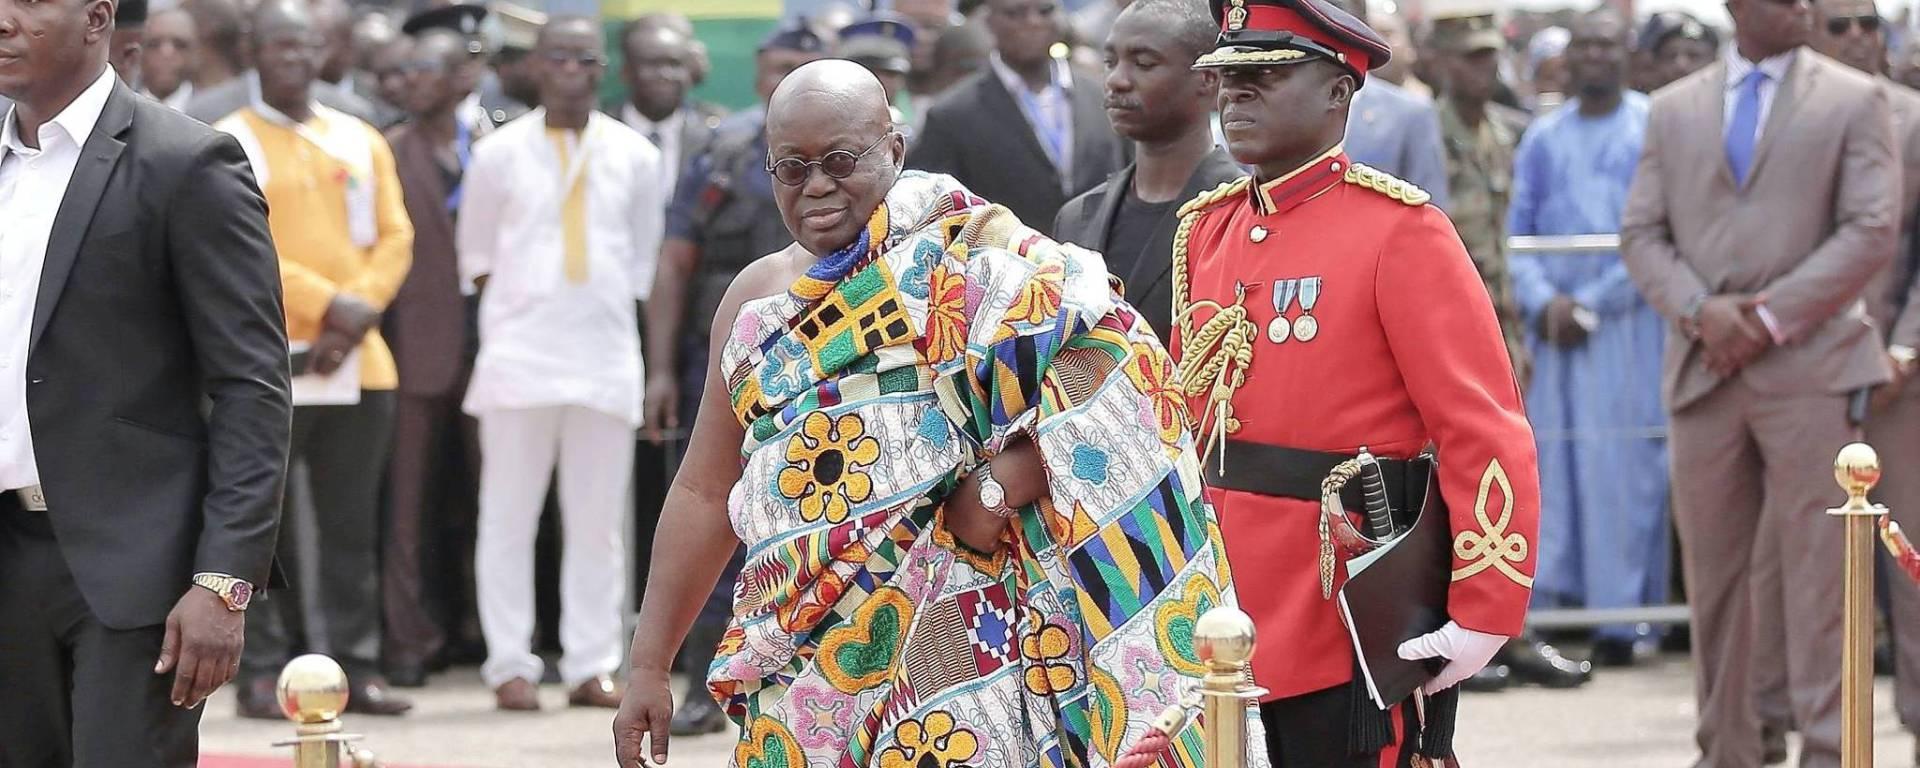 110 ministres pour un pays comme le Ghana, it's too  much!